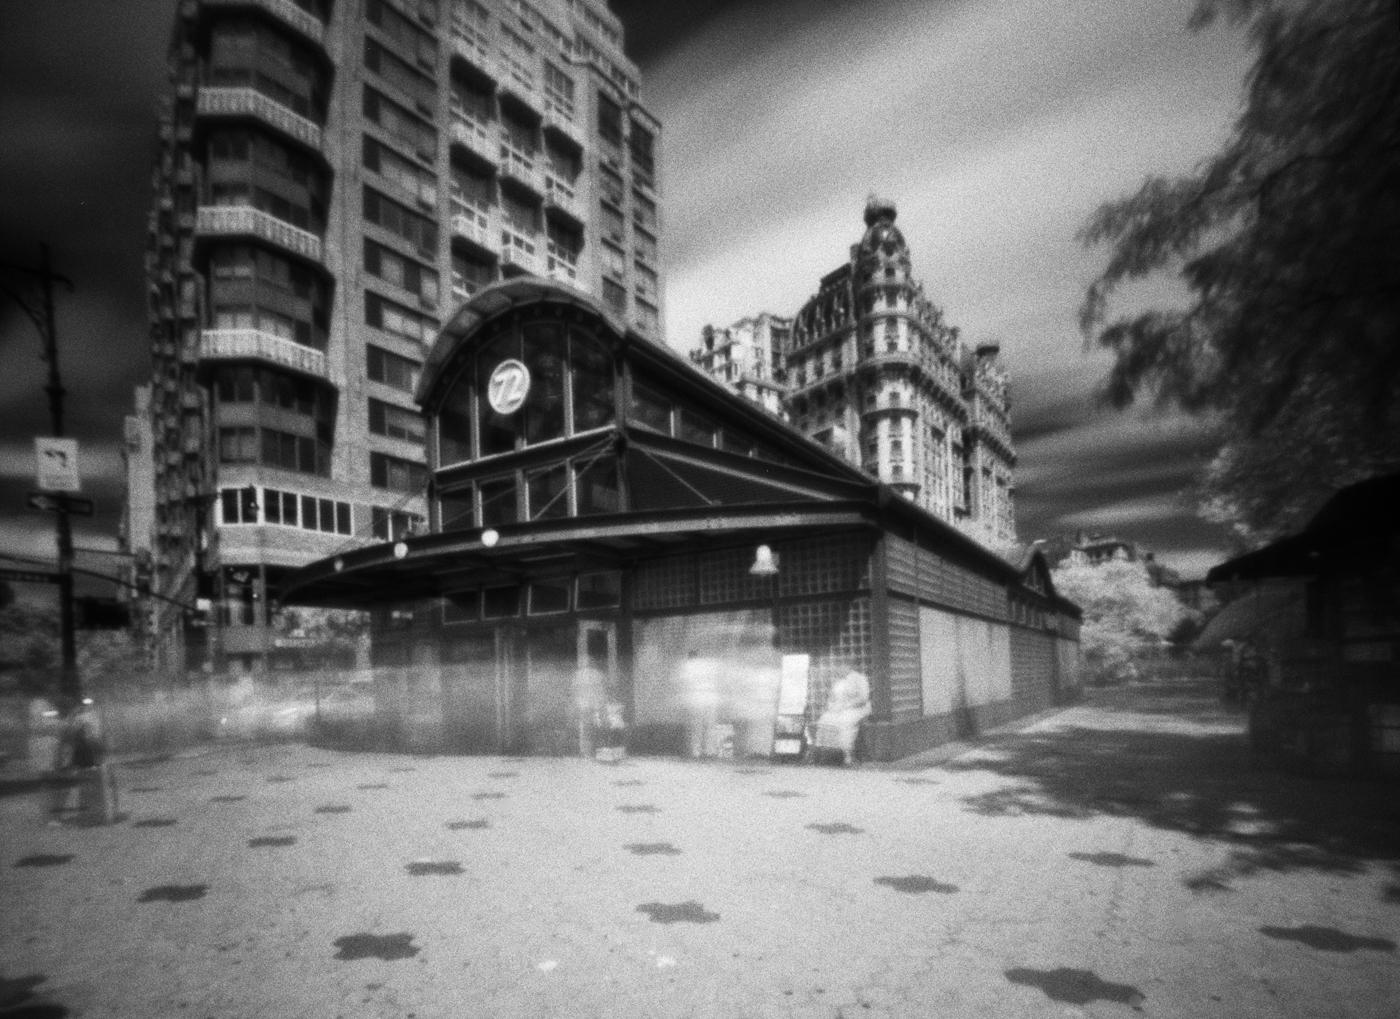 72 Street Subway Station